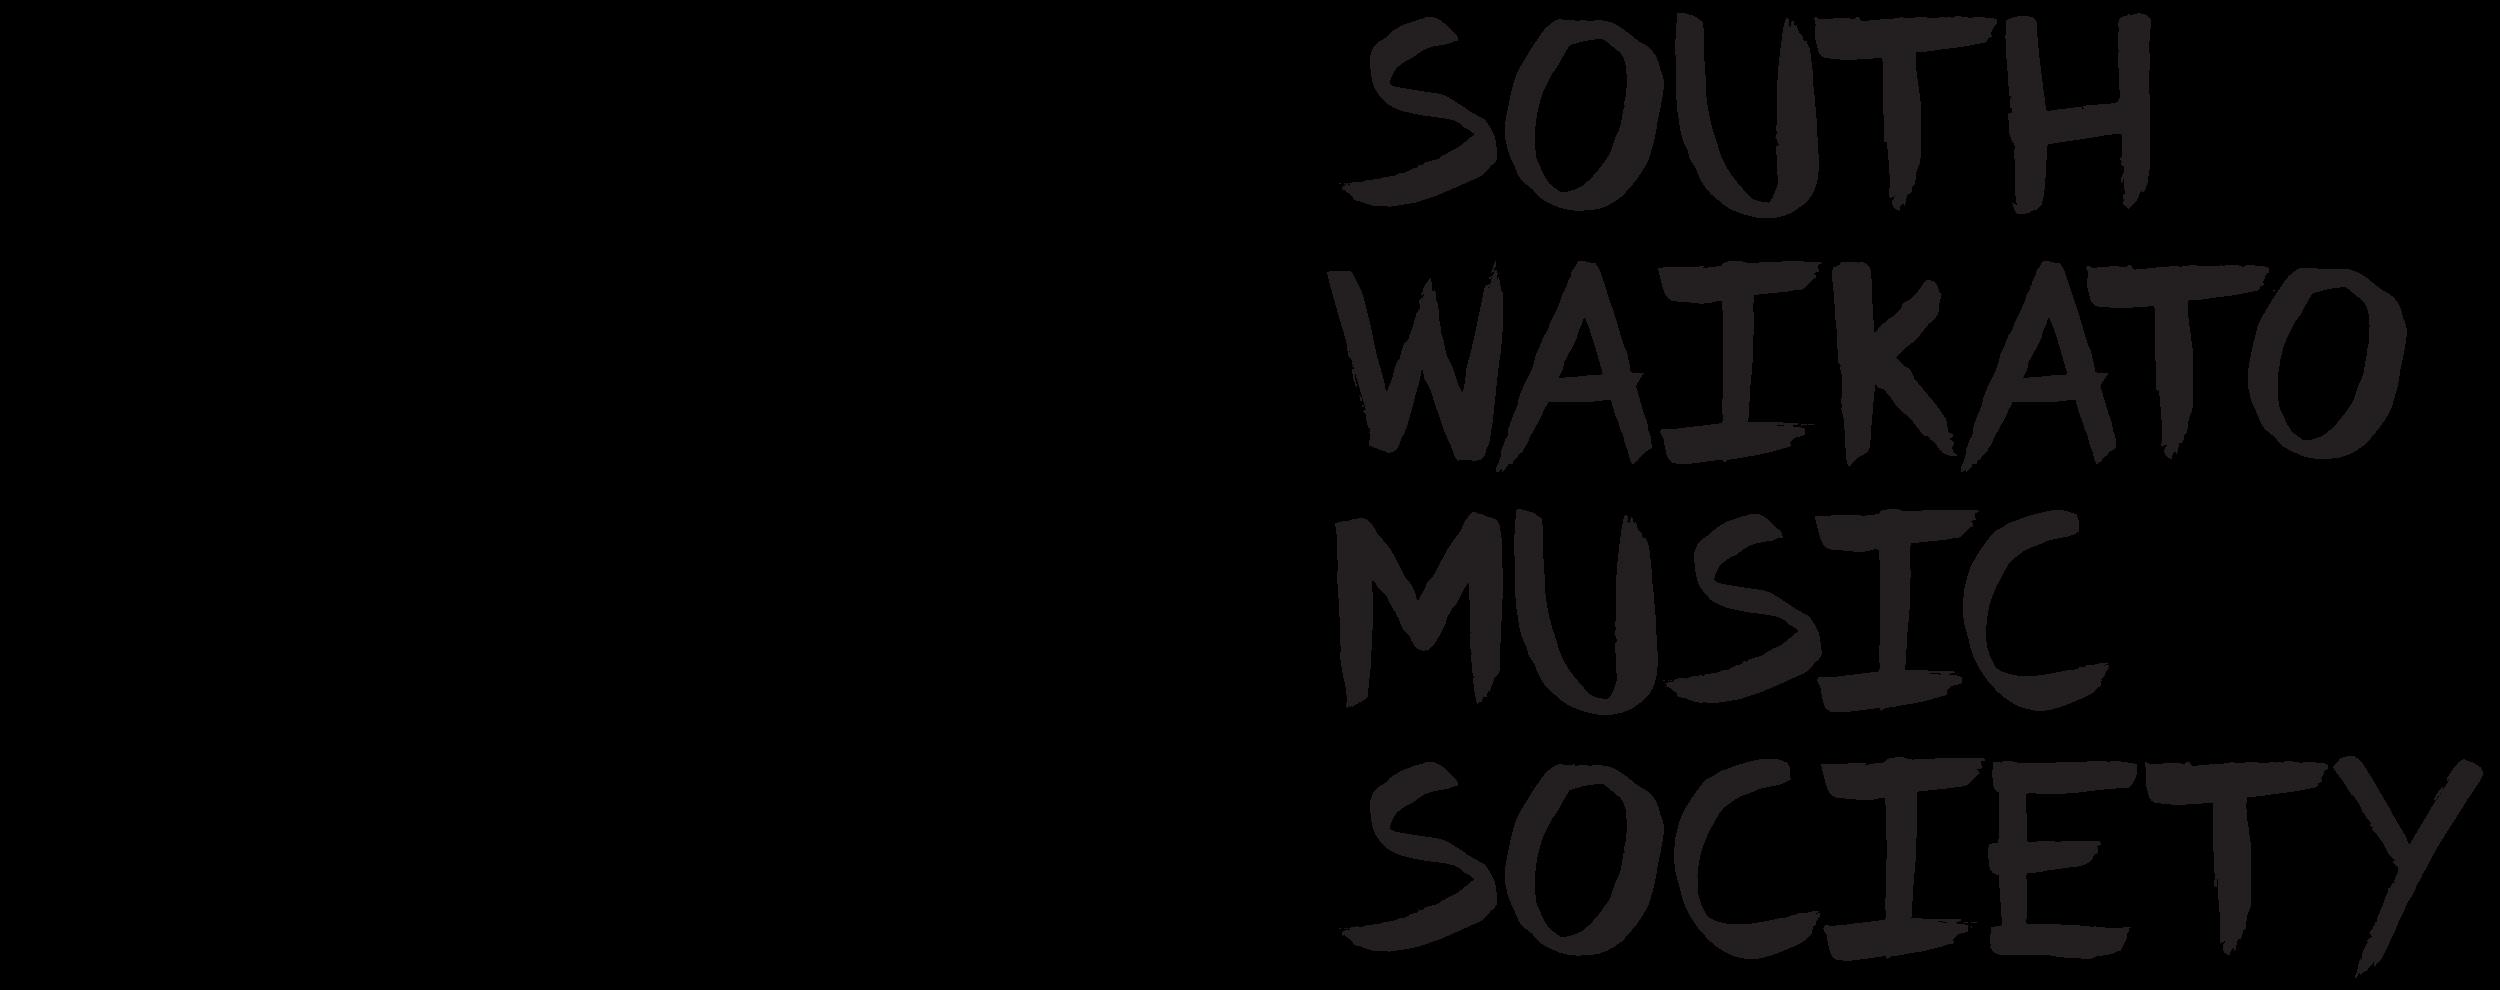 Logo incl text.png